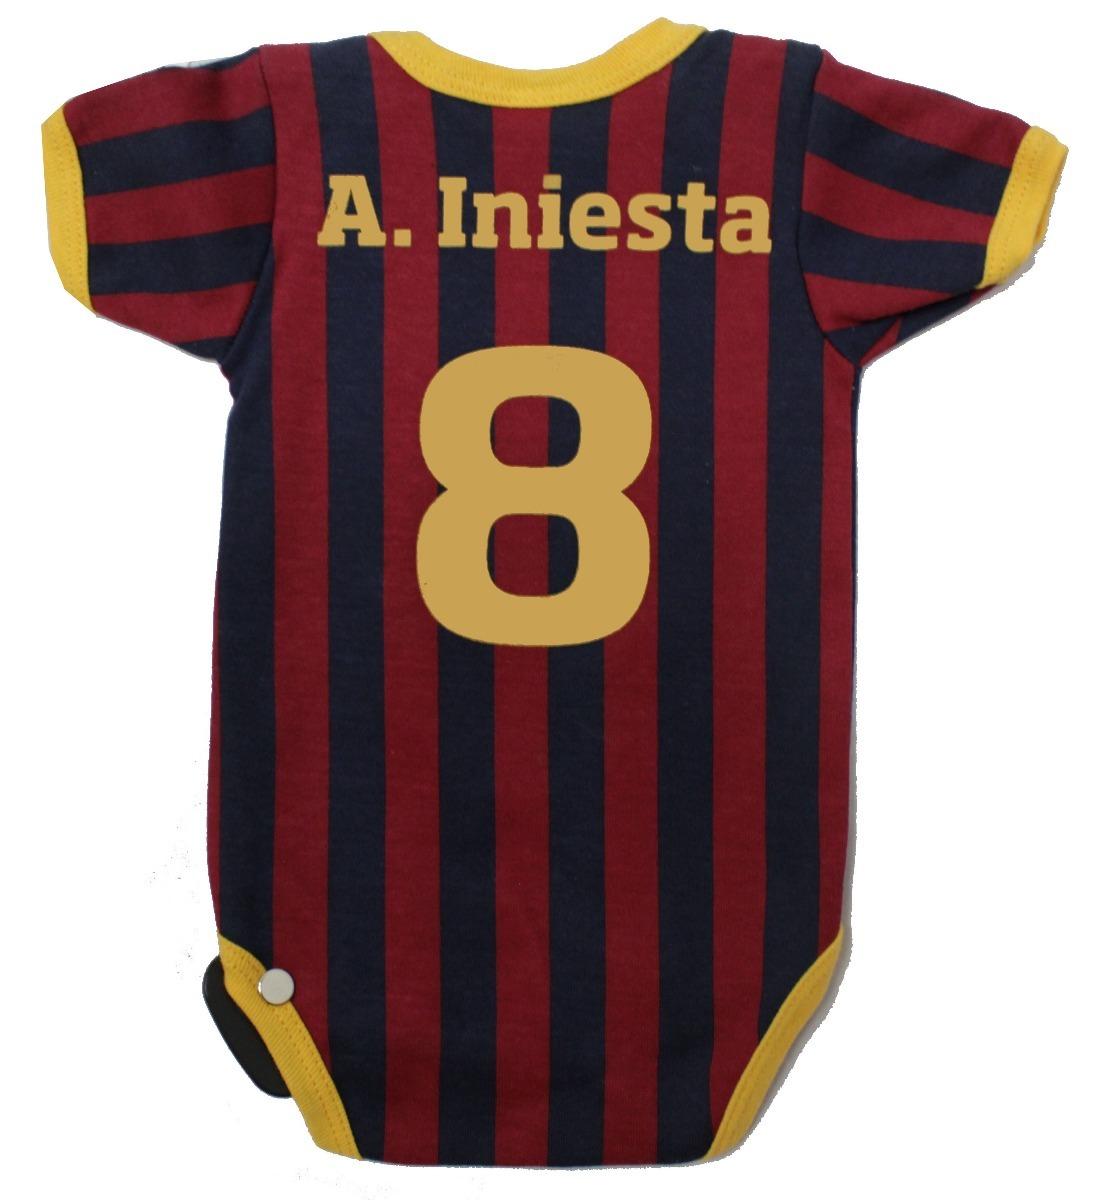 Cargando zoom... pañalero fc barcelona futbol inesta original - ropa de bebe 705d90d86d6fa